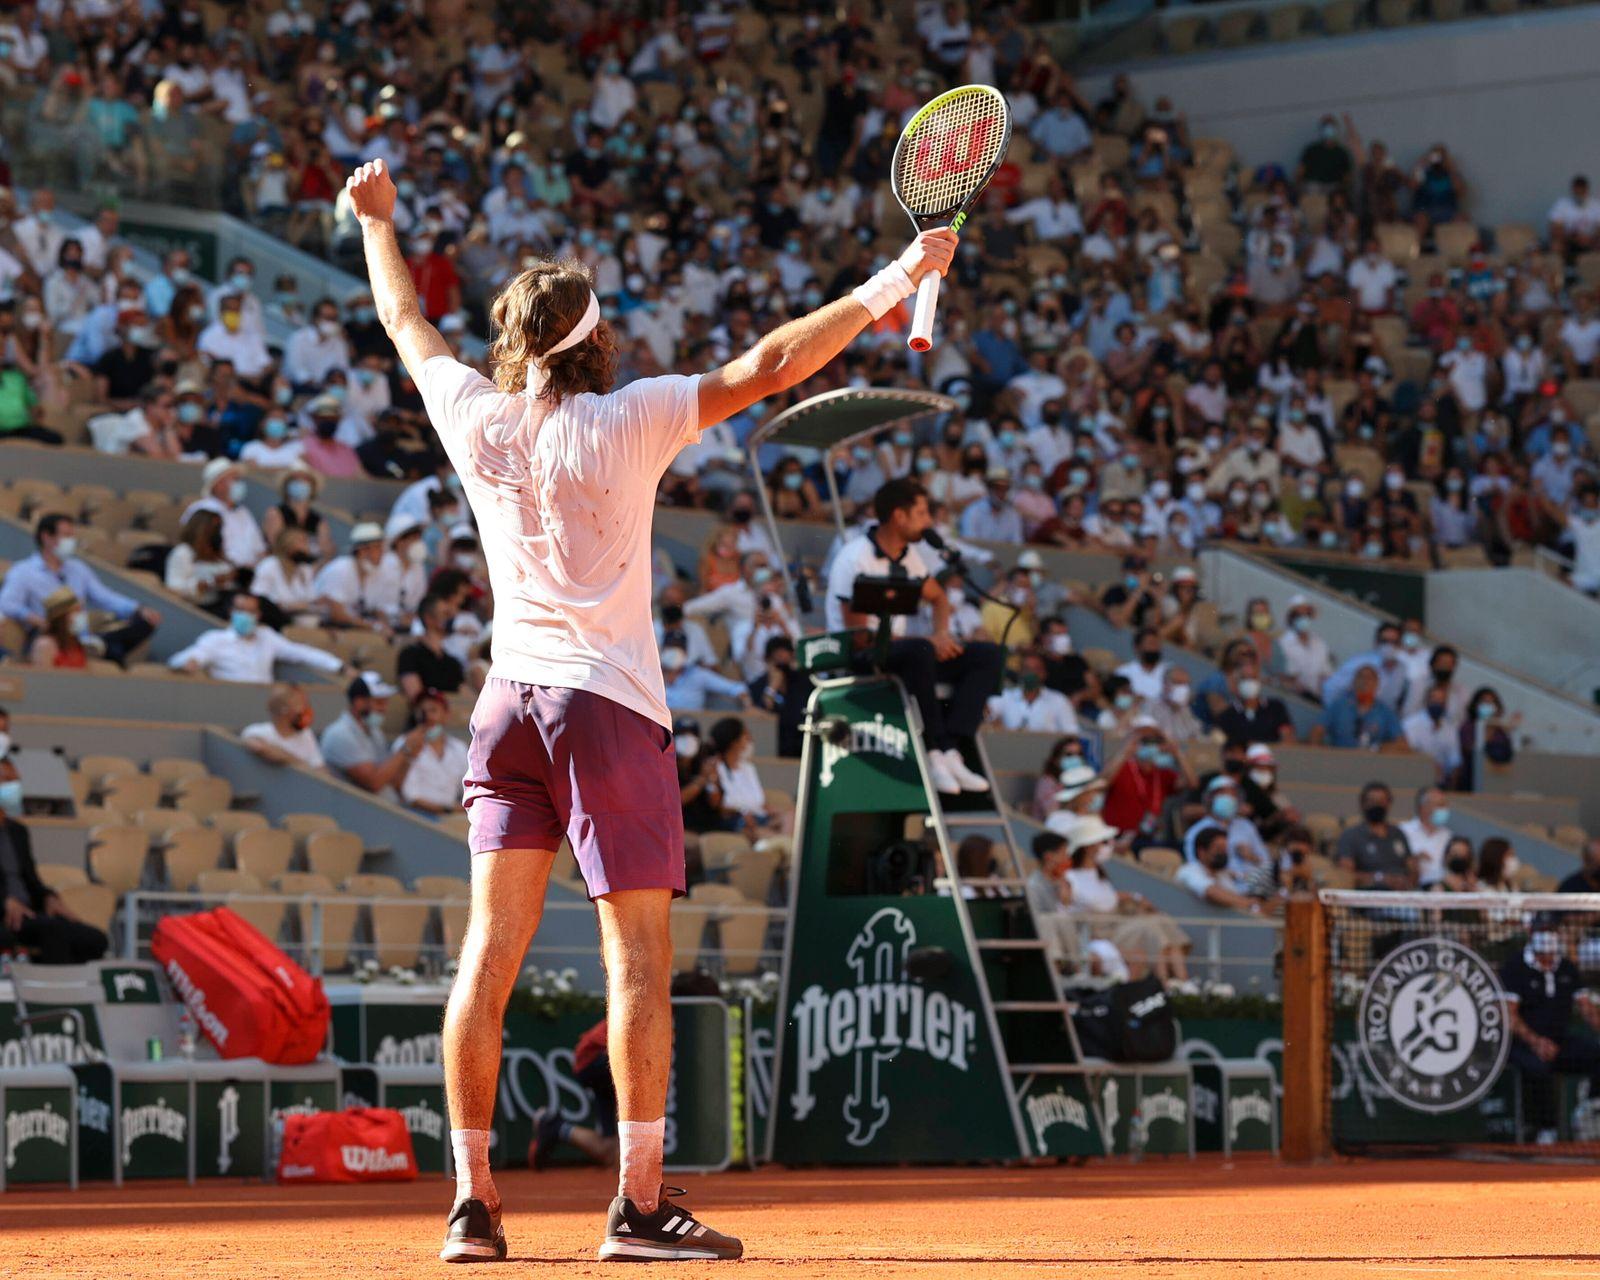 Stefanos Tsitsipas Tennis - French Open 2021 - Grand Slam - Roland Garros - Paris - - France - 11 June 2021. *** Stefano